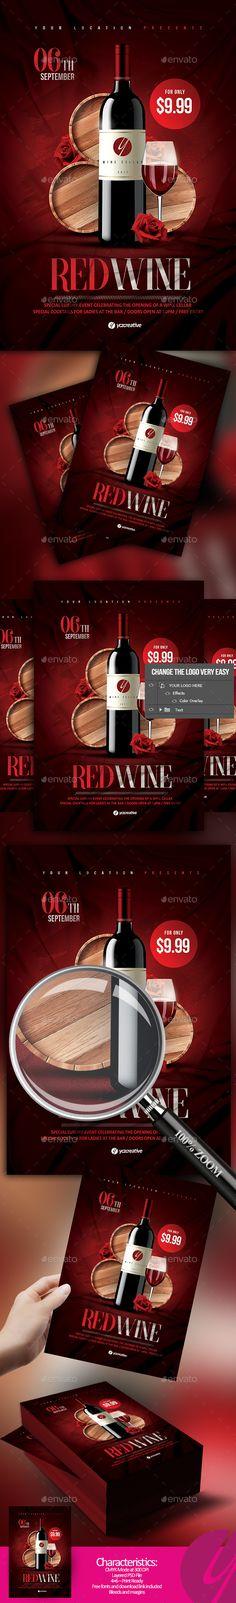 Red Wine Flyer - #Restaurant Flyers Download here:  https://graphicriver.net/item/red-wine-flyer/20032037?ref=alena994